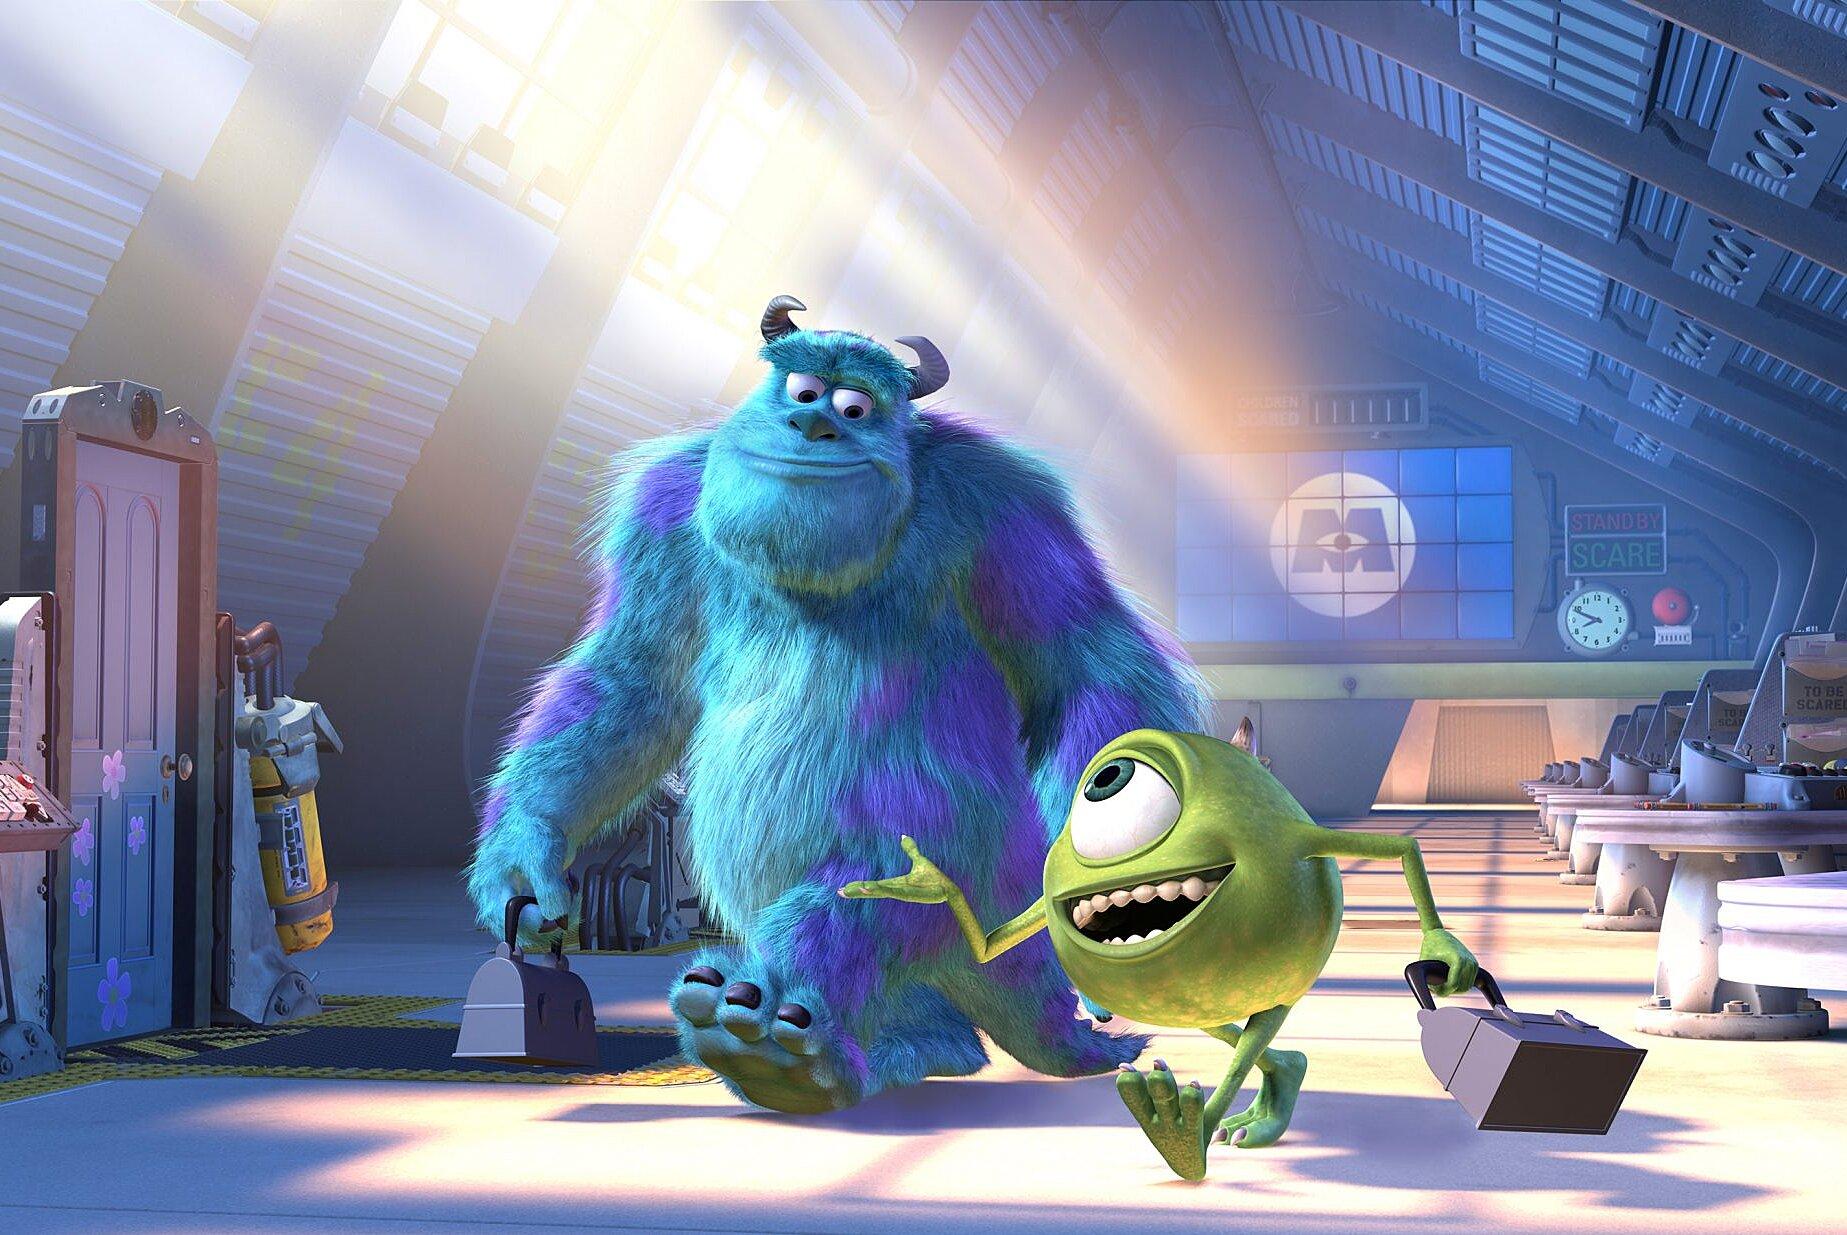 Billy Crystal, John Goodman to reunite for 'Monsters, Inc.' TV show   EW.com